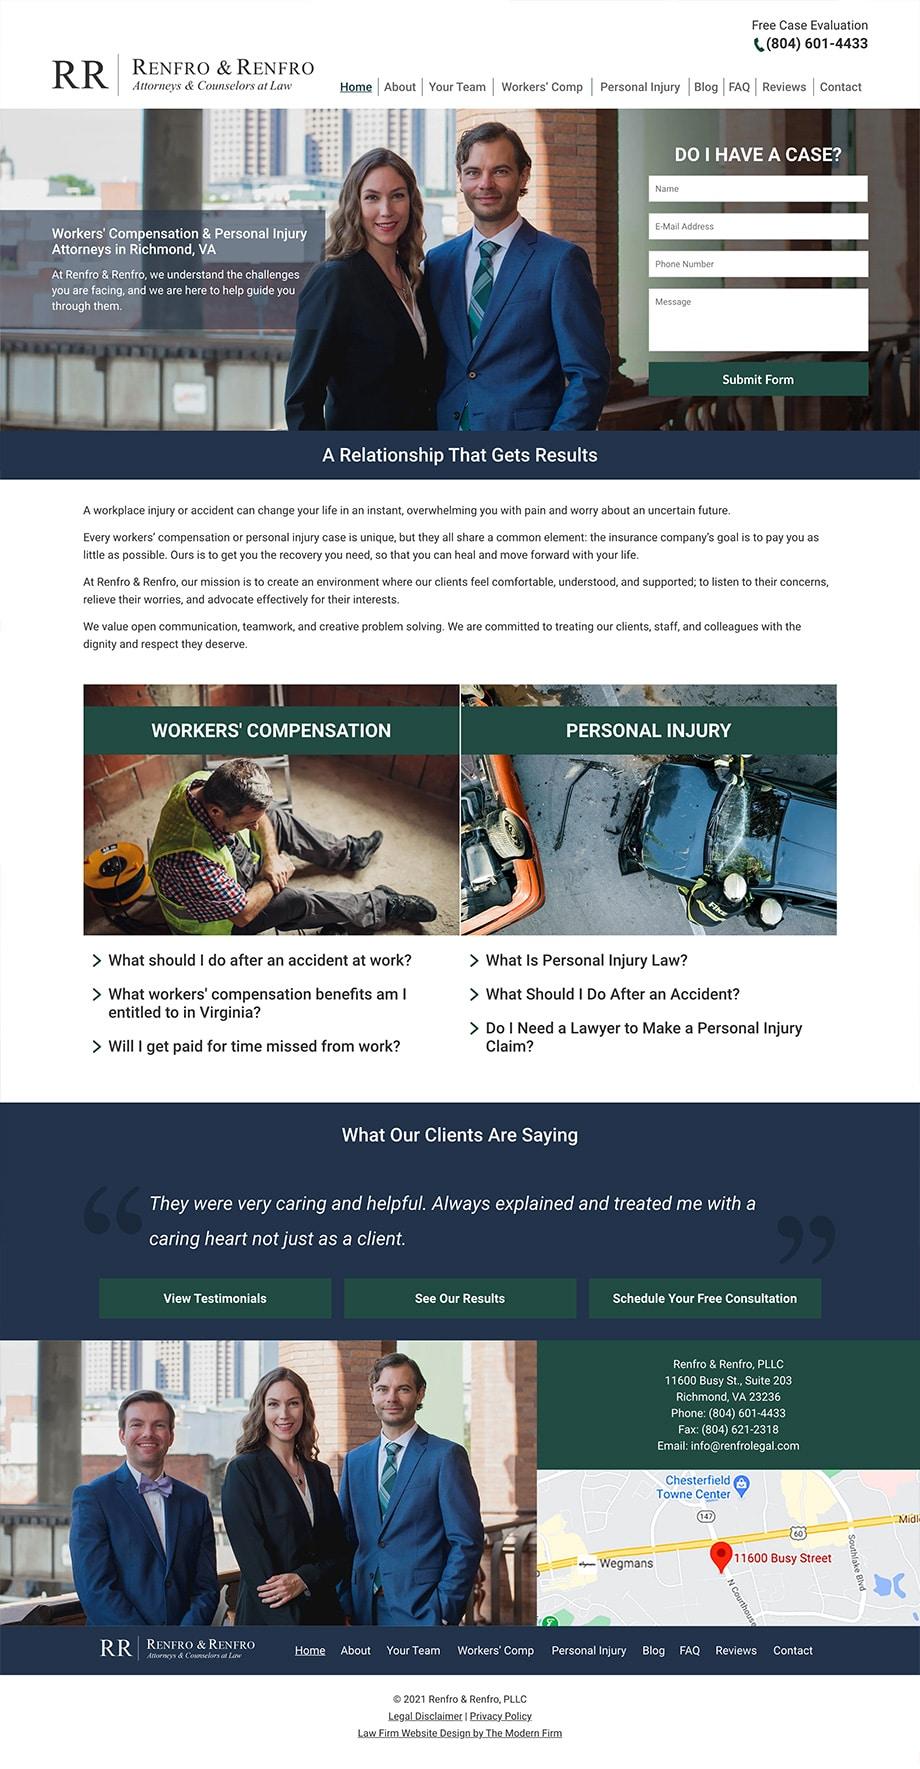 Law Firm Website Design for Renfro & Renfro, PLLC